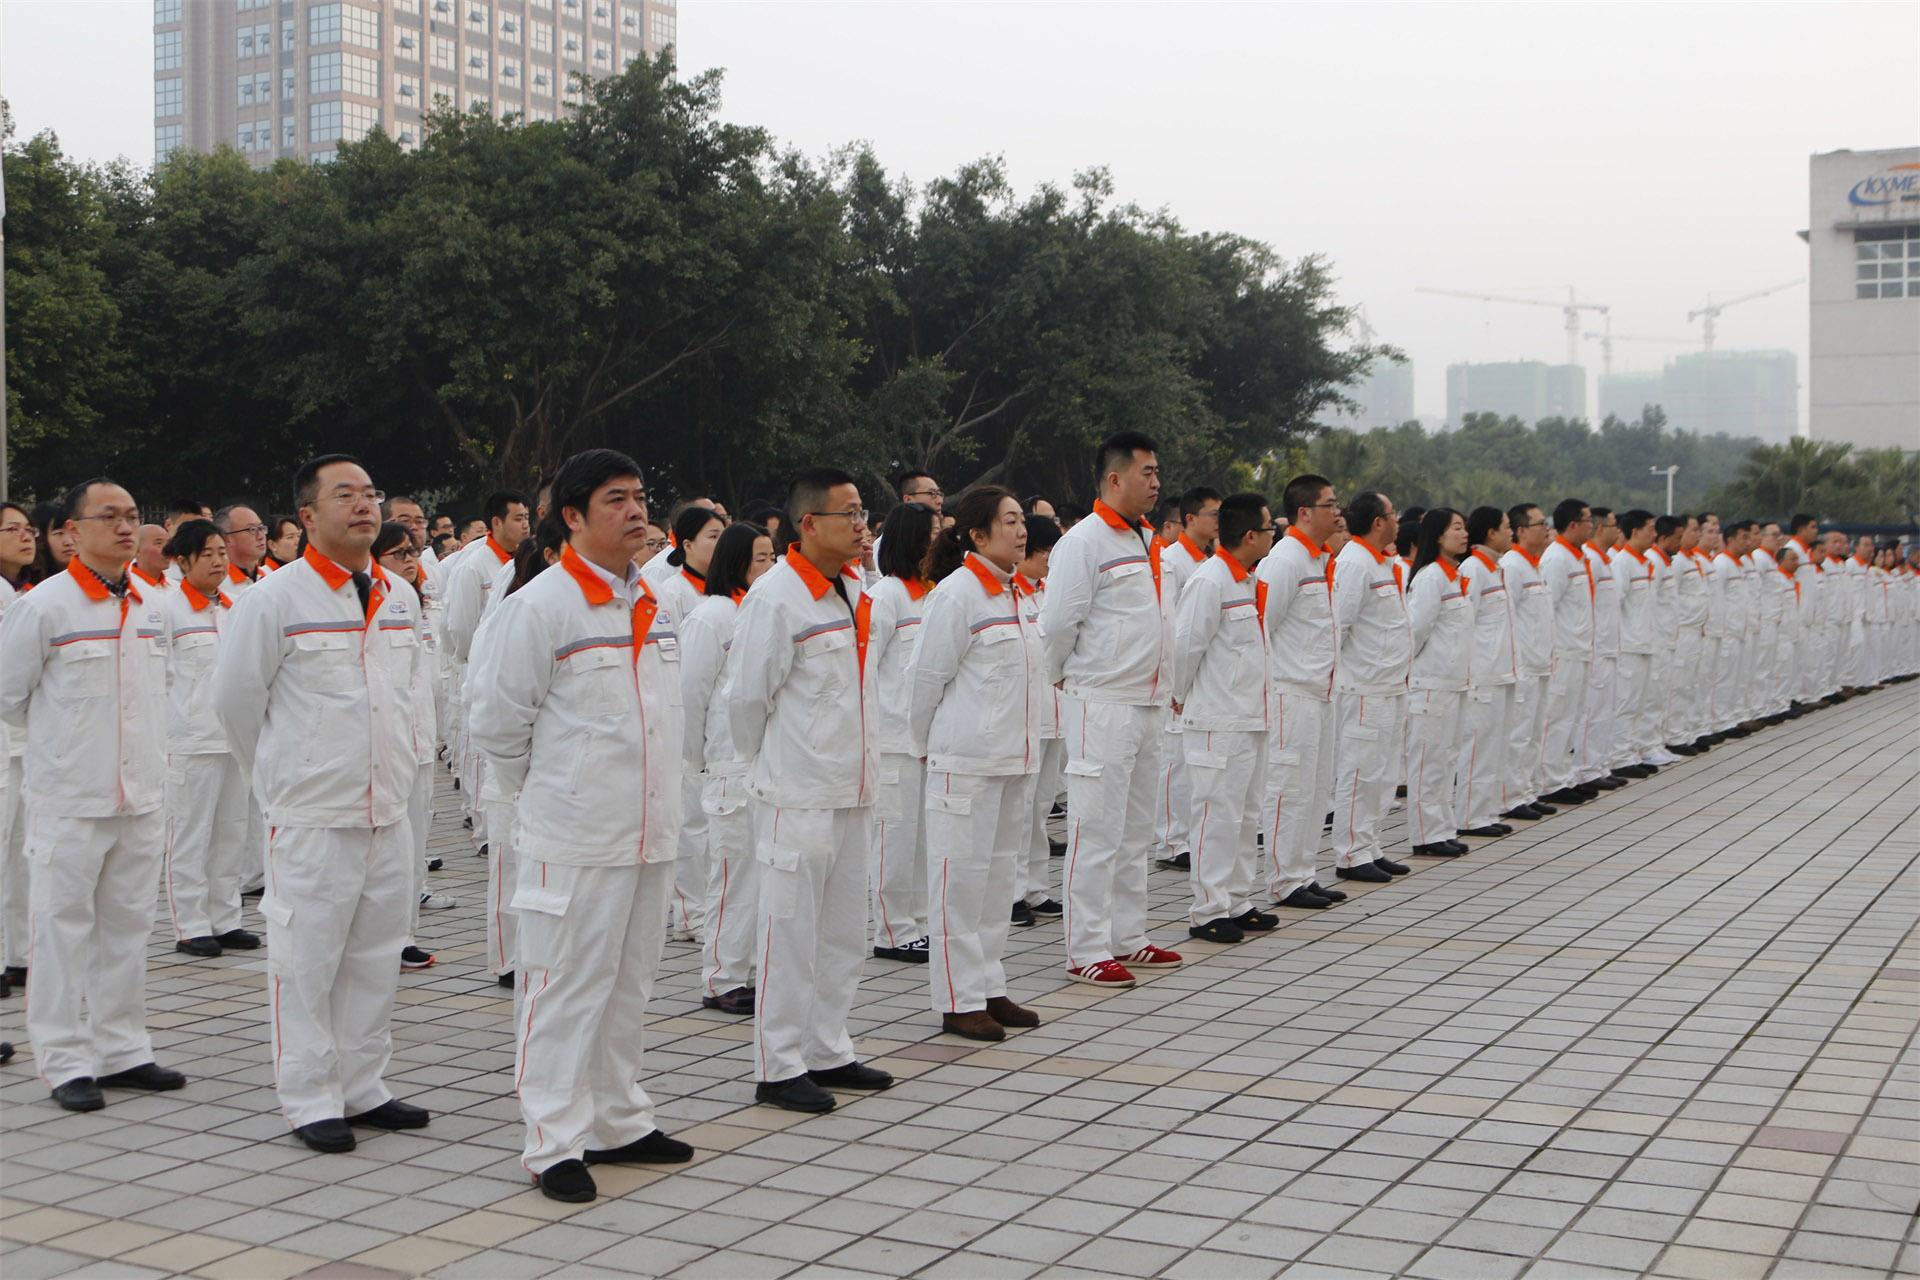 http://qiniu.cloudhong.com/image_2020-01-12_5e1ac9b1d80e1.jpg